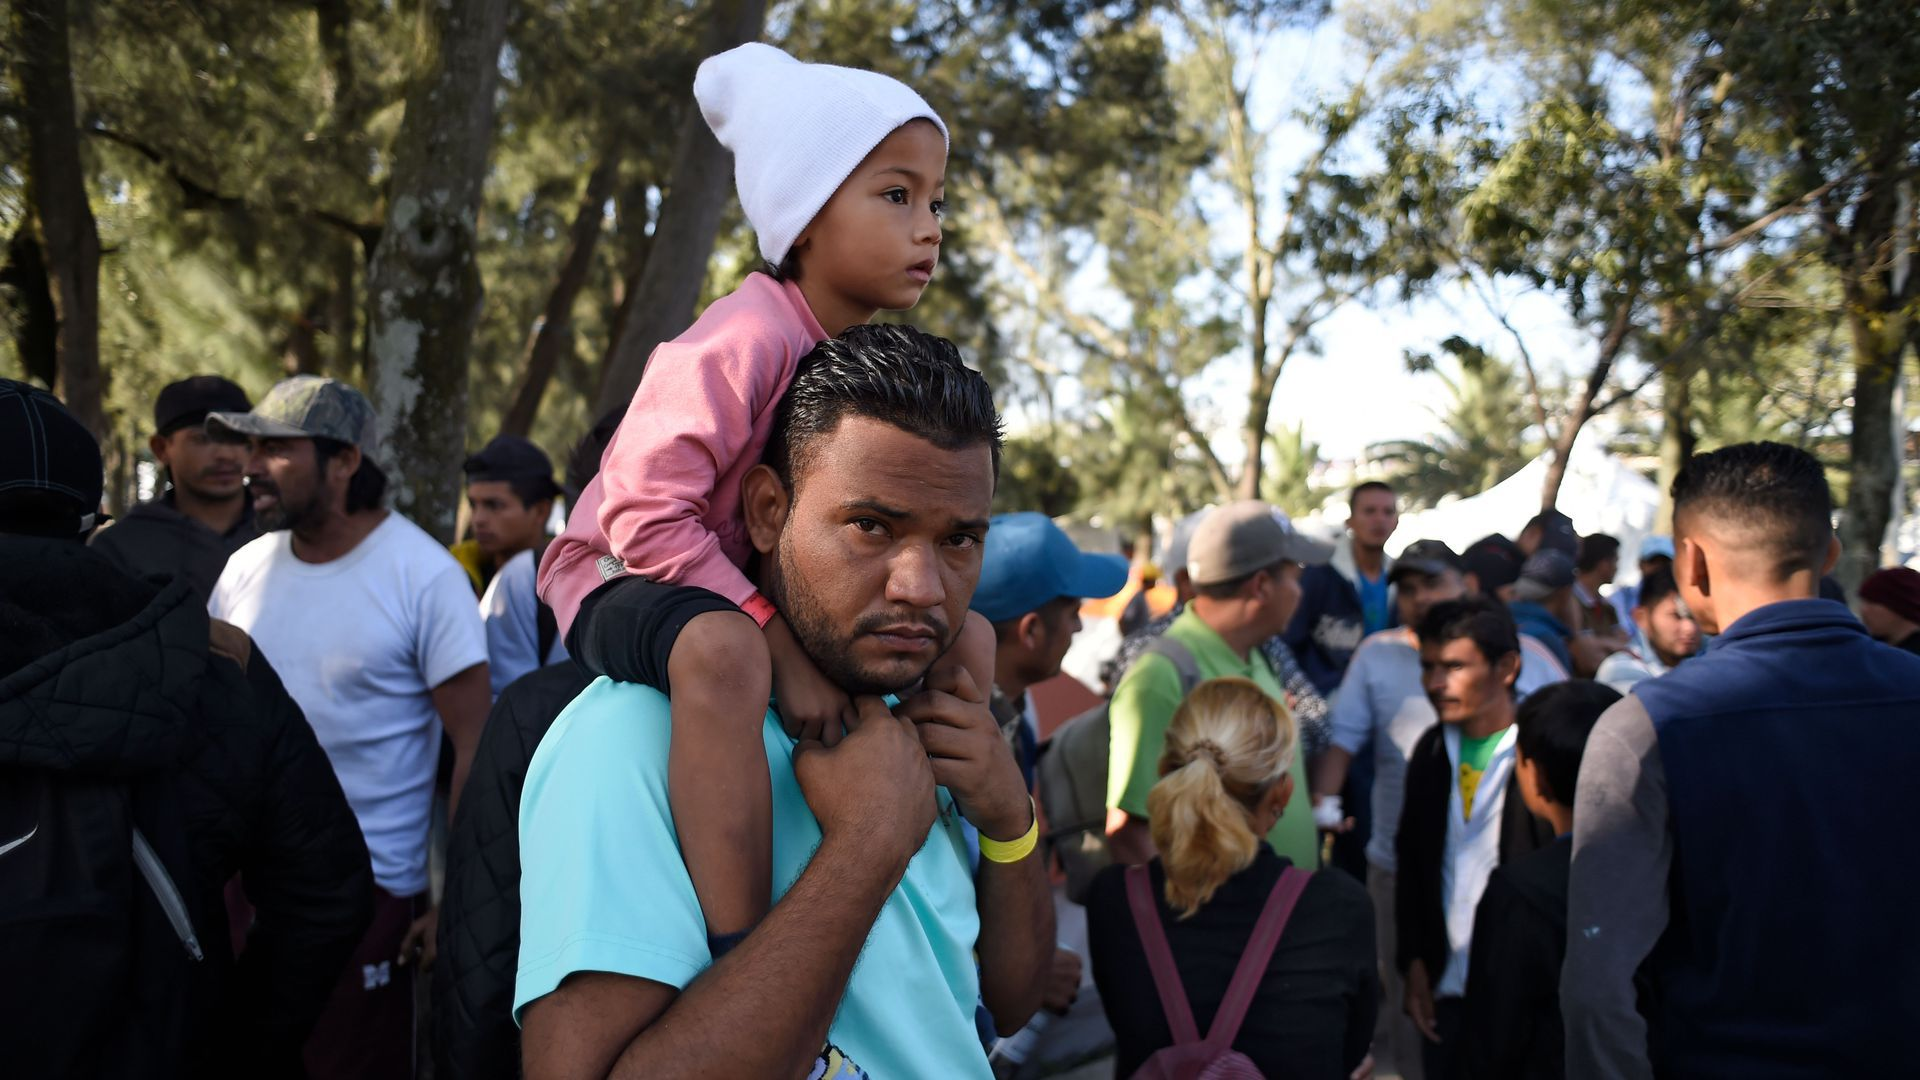 Two members of the migrant caravan